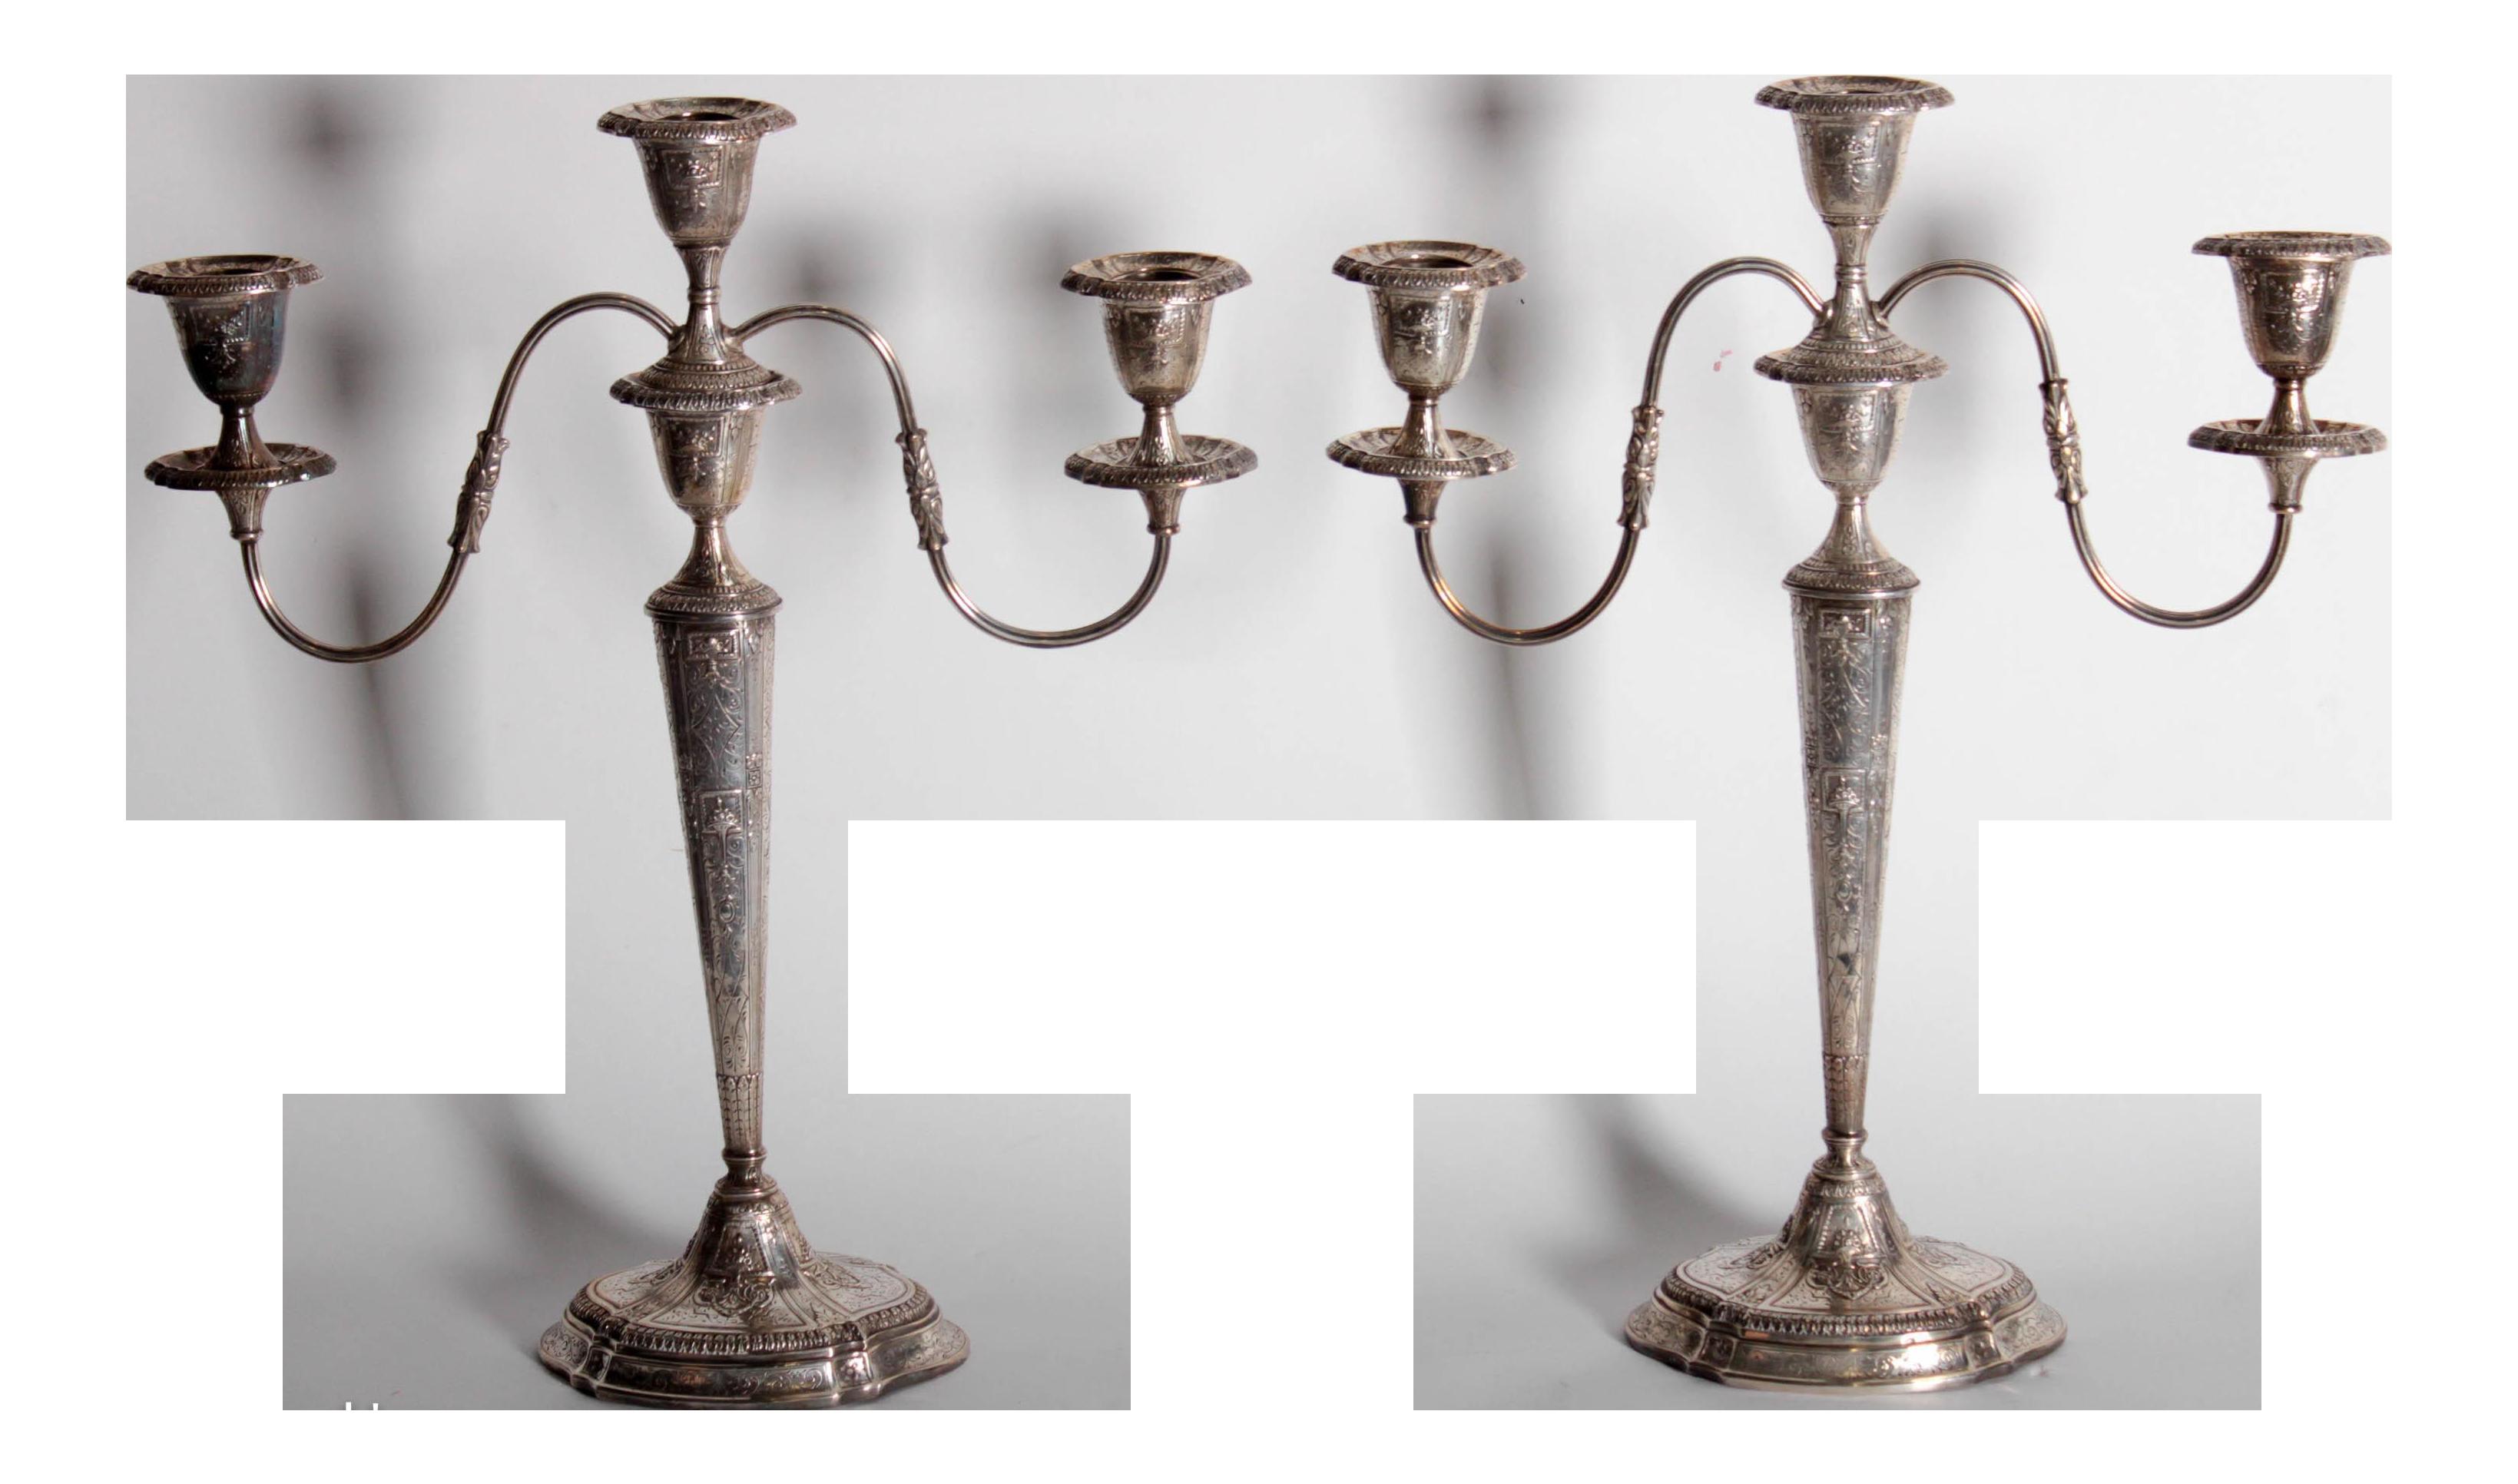 antique e g webster silverplate embossed candelabras a